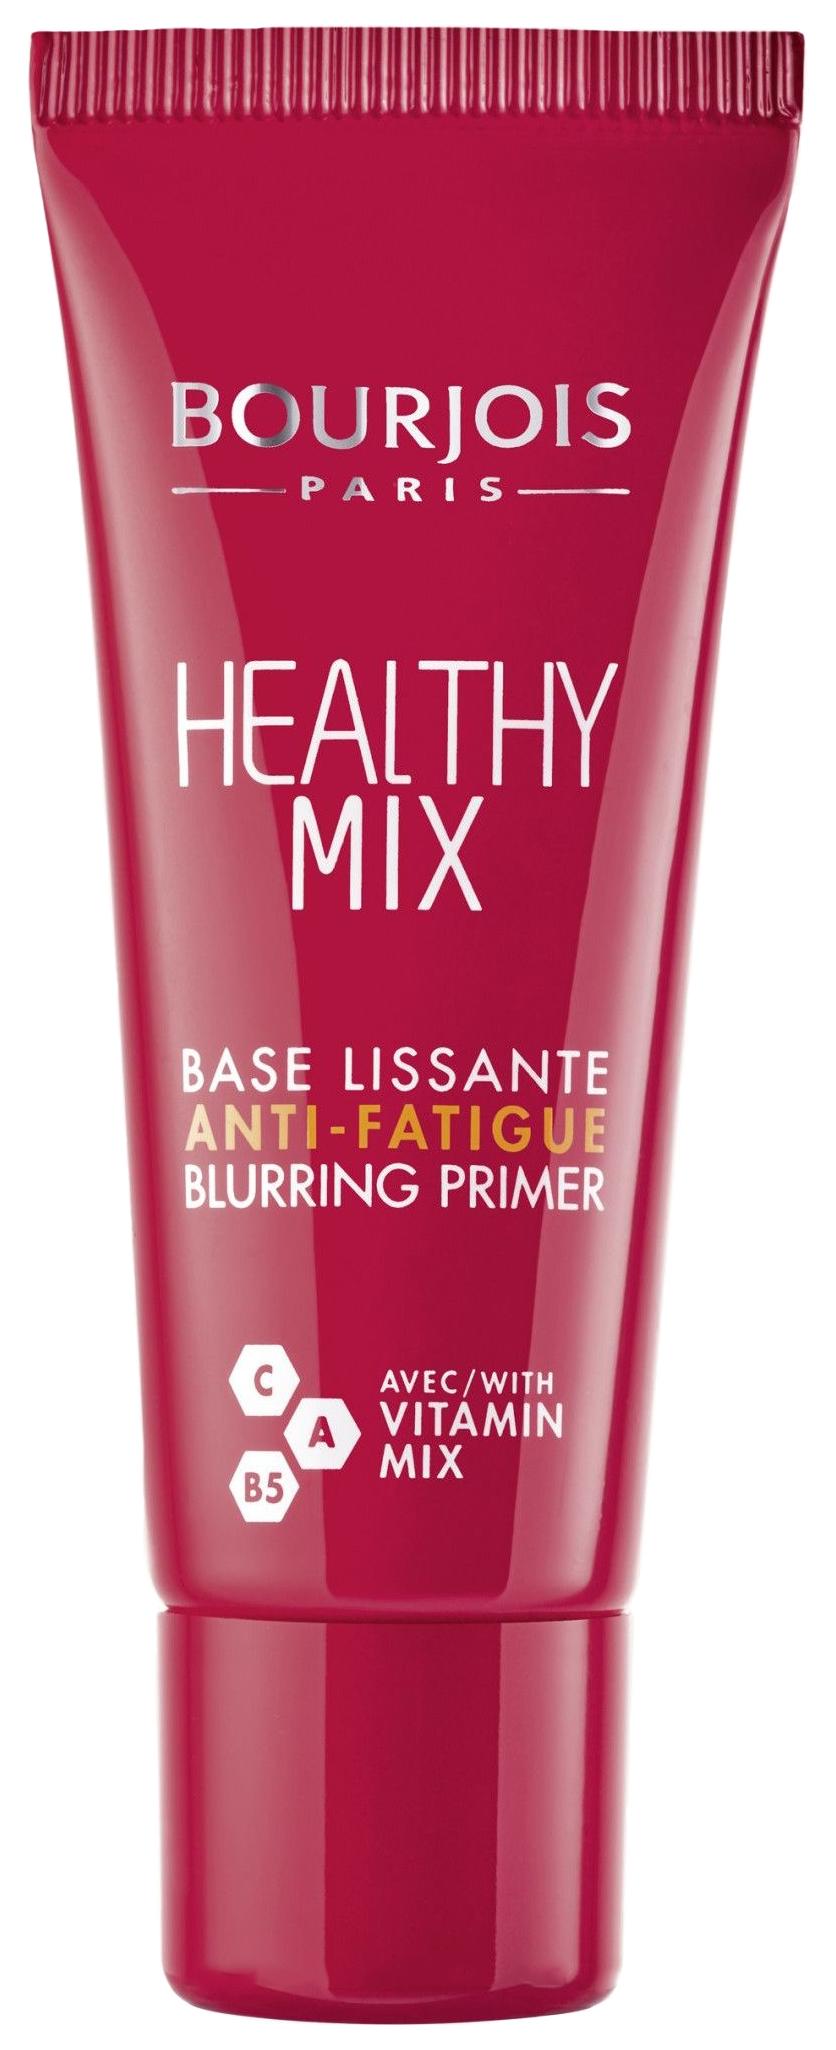 Основа для макияжа Bourjois Healthy Mix Anti